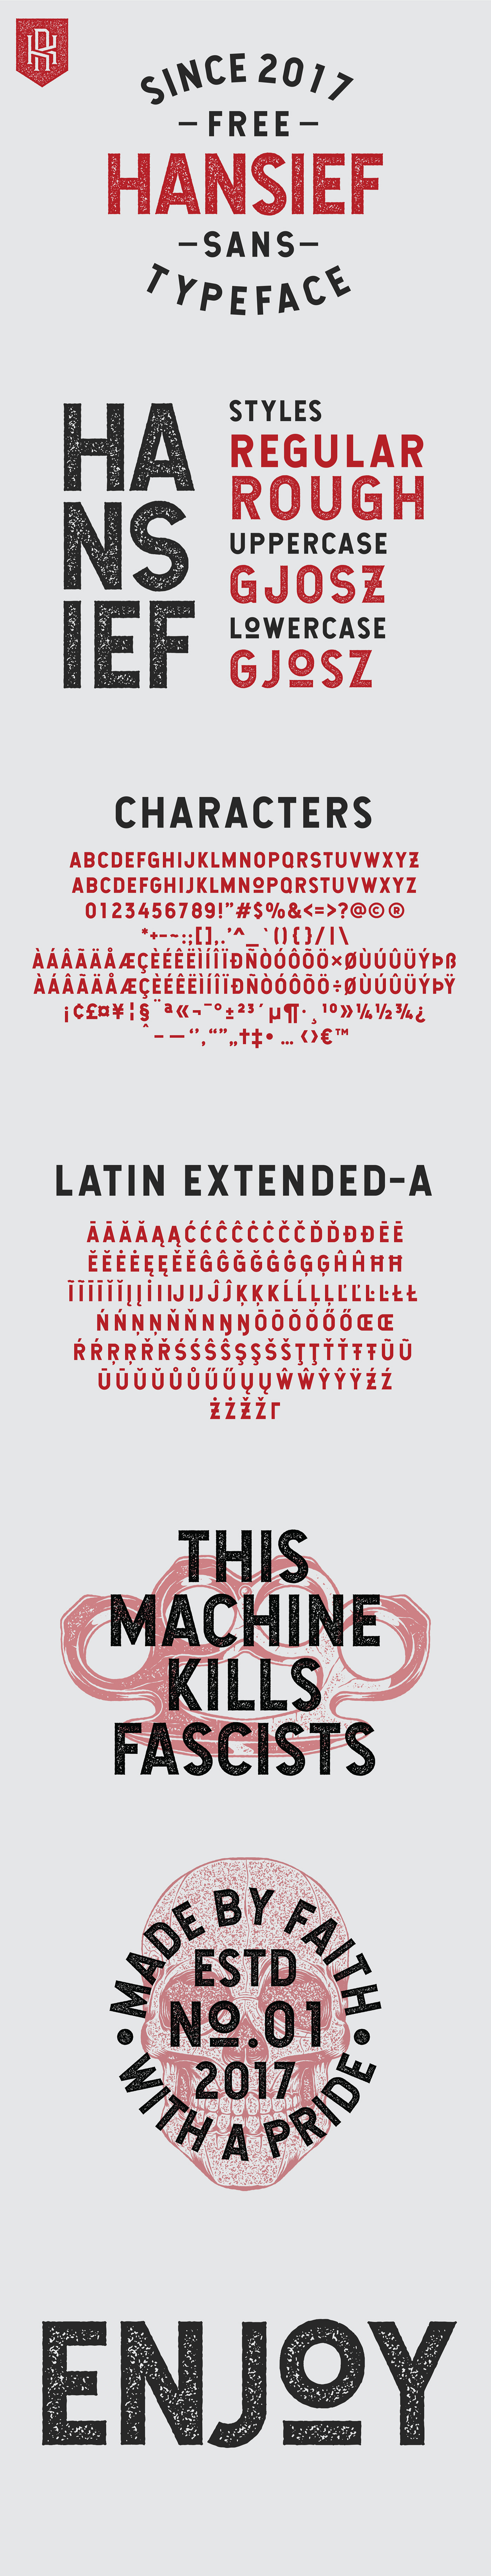 Free font free freebie sans serif free fonts vintage logo Badges commercial use texture